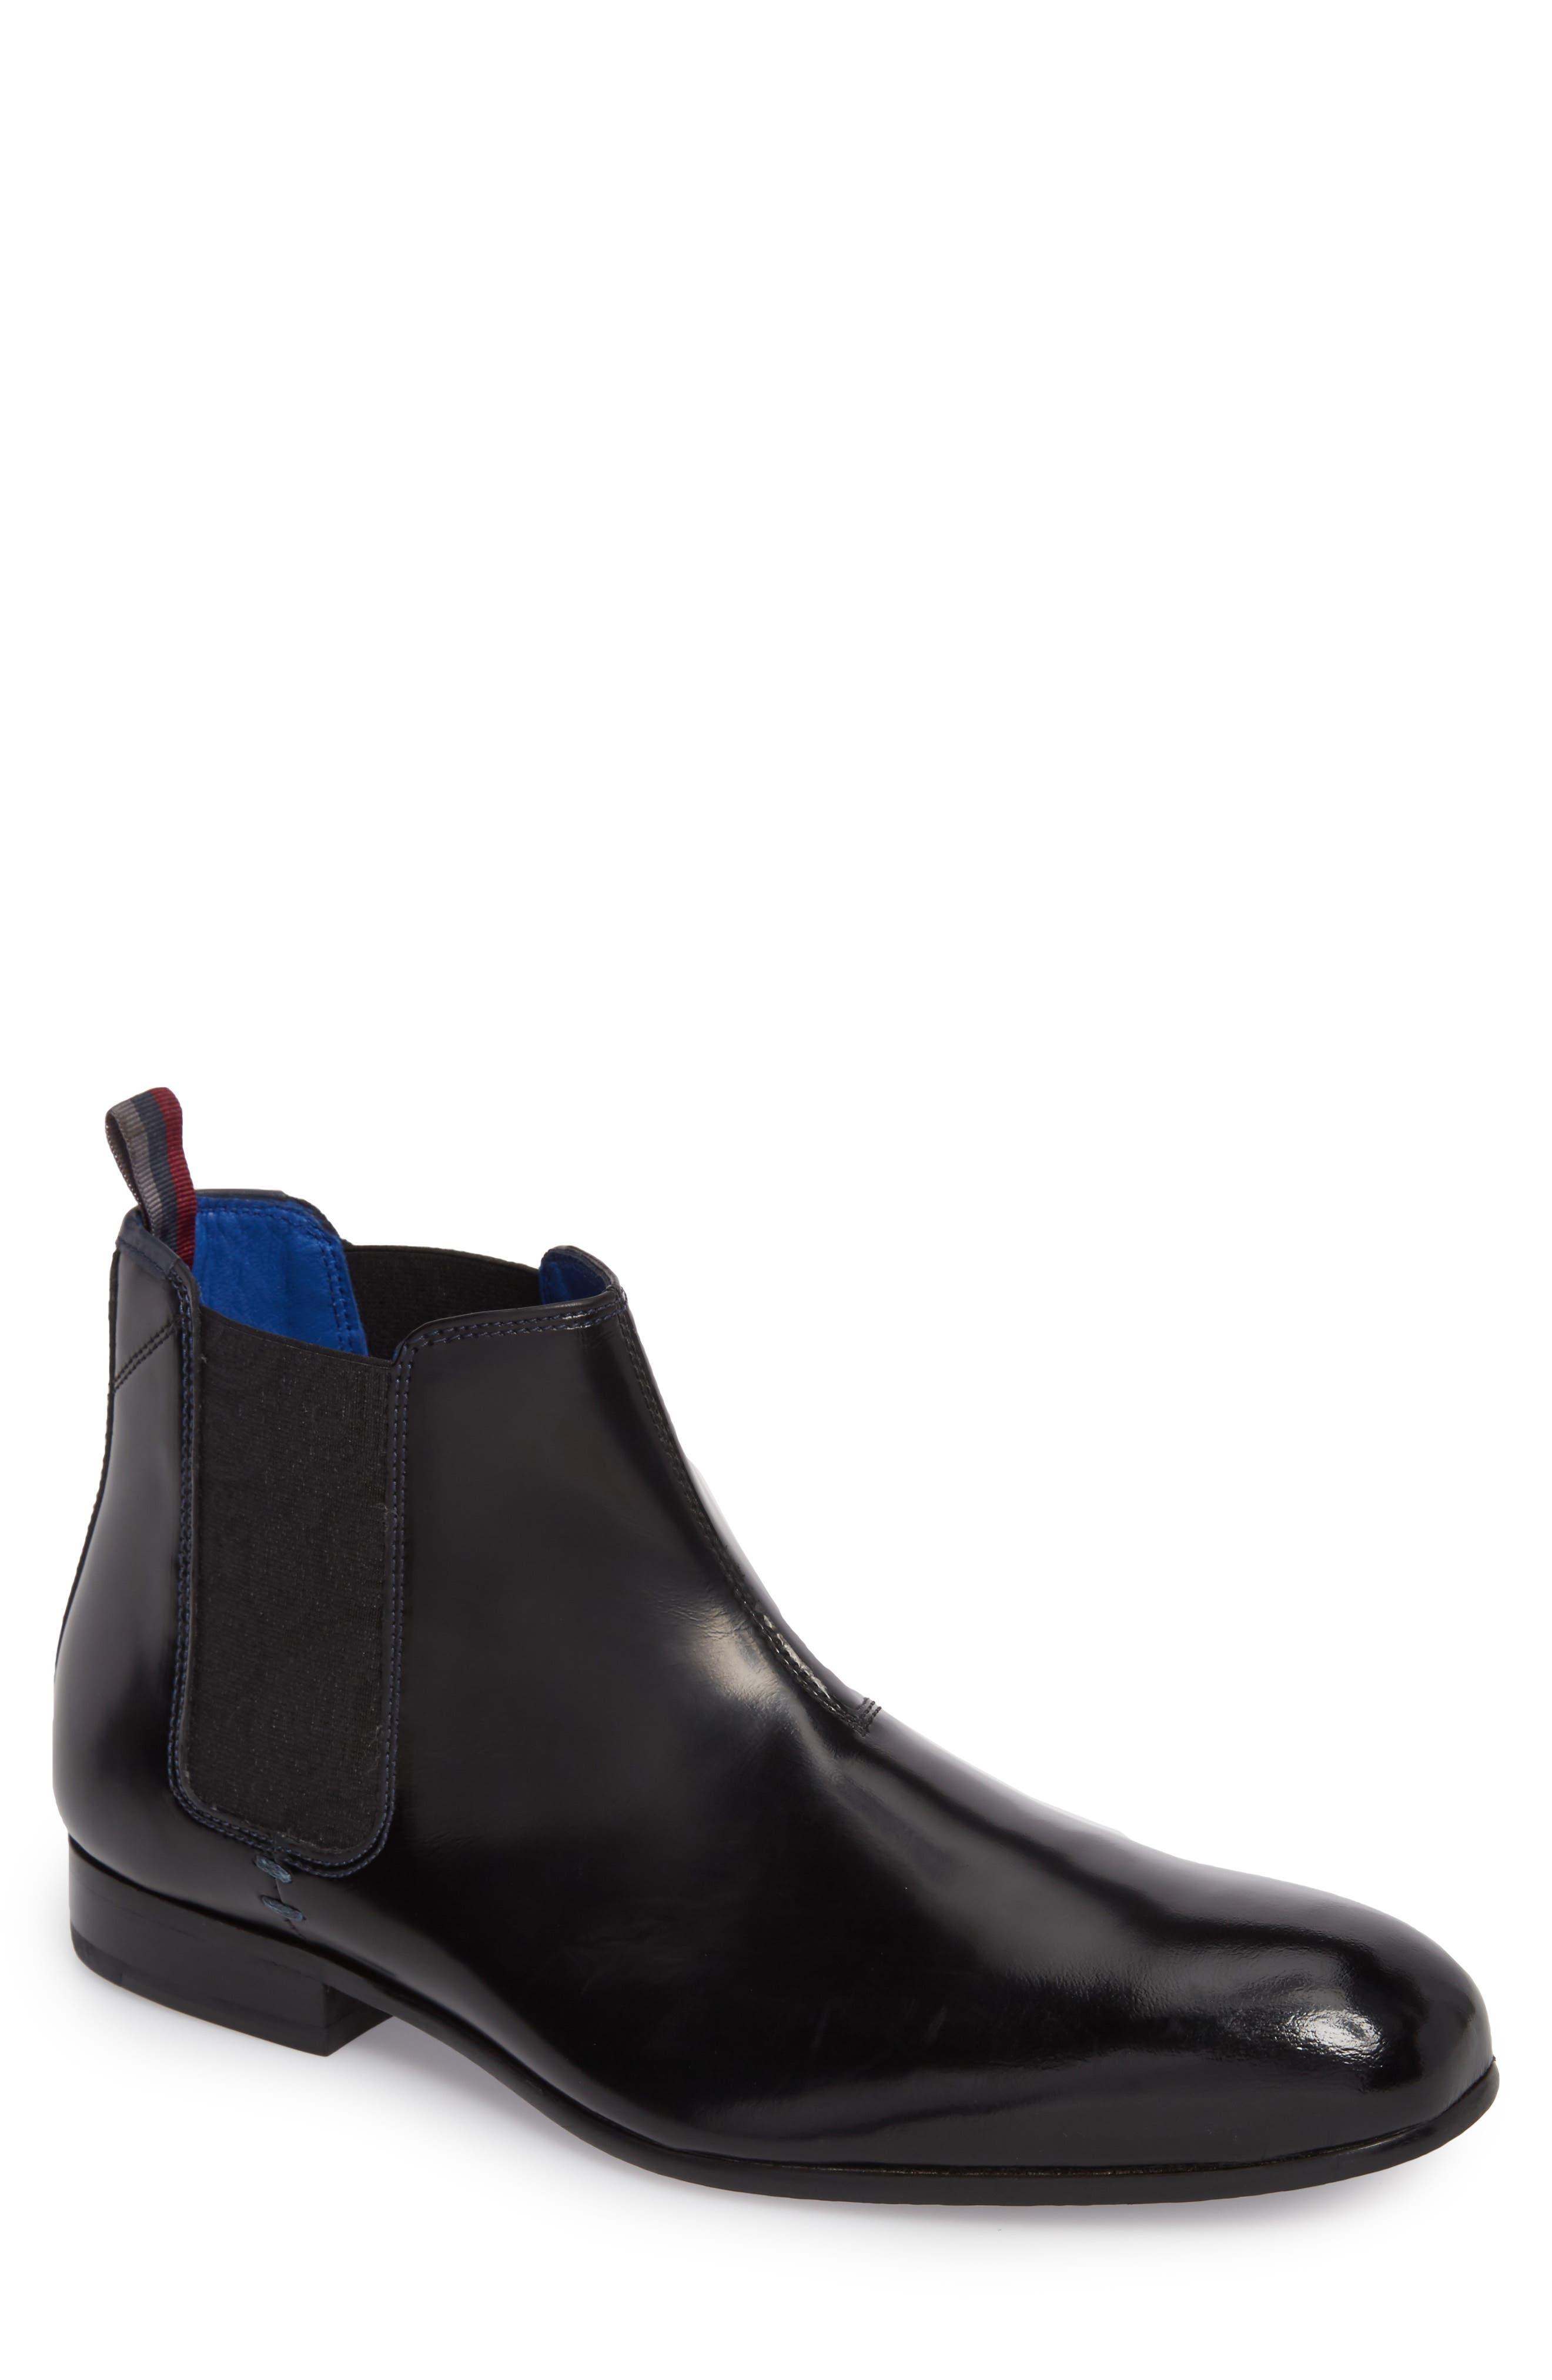 Auldham Chelsea Boot,                             Main thumbnail 1, color,                             Black Leather